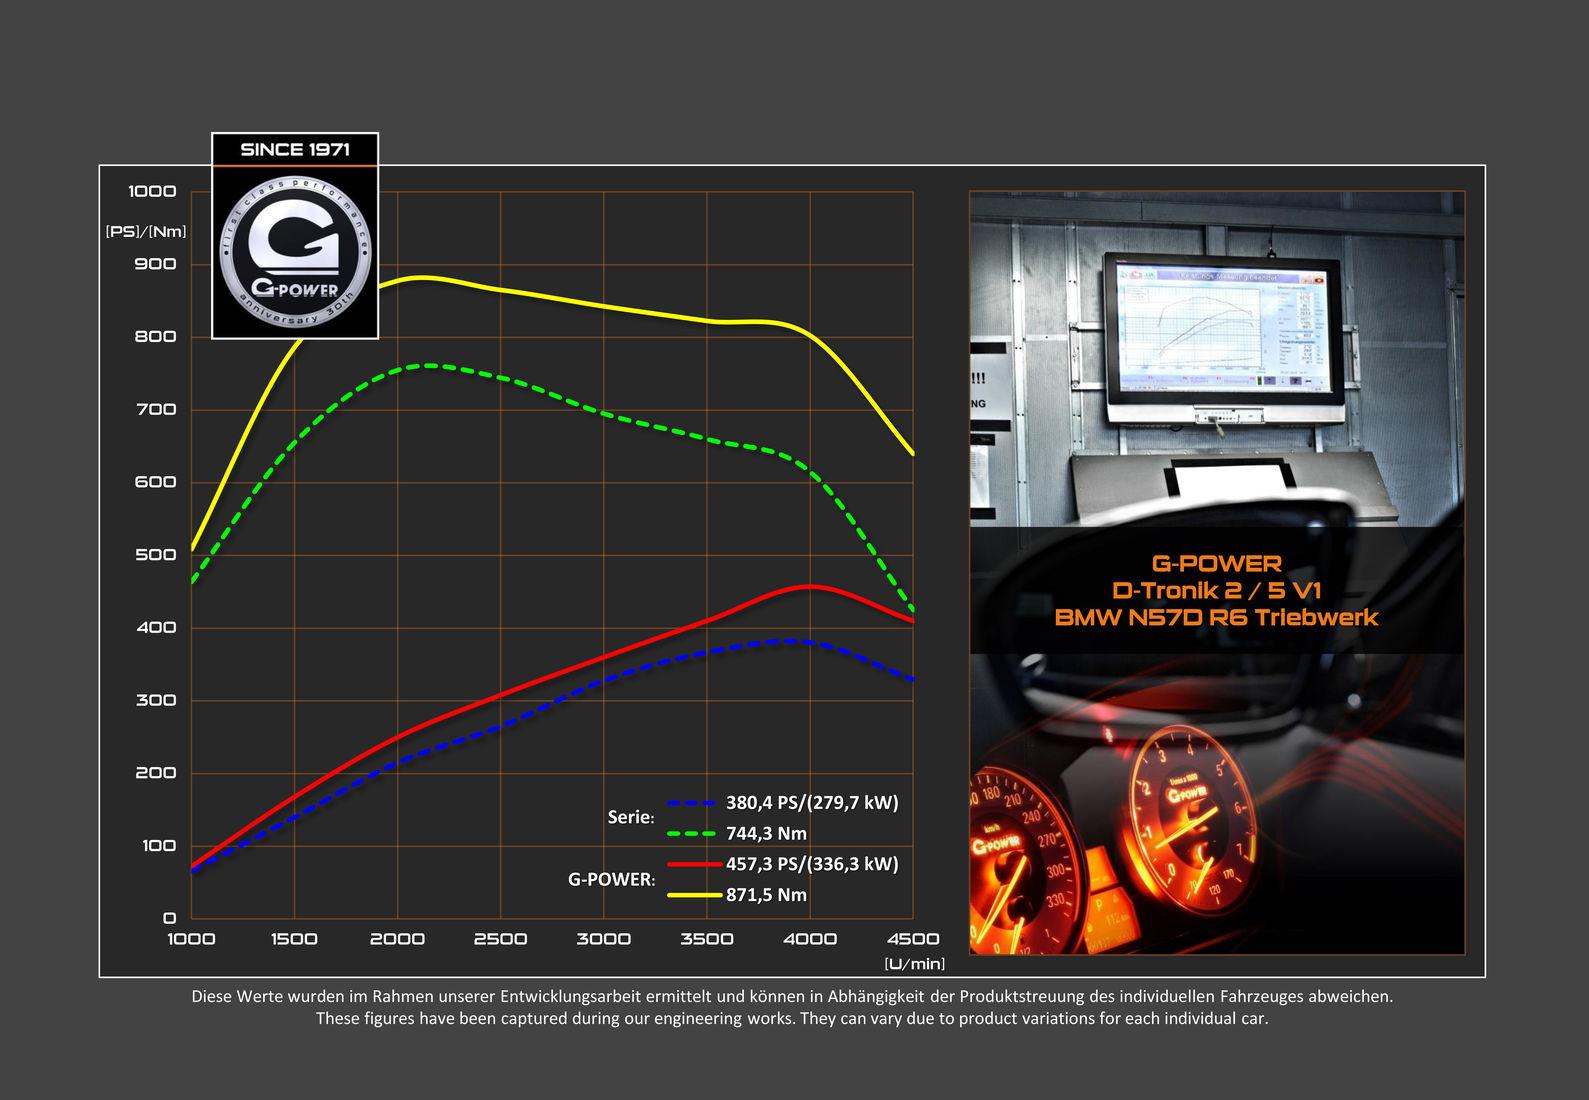 g power x5 x6 m50d f1x d tronik 2 5 v1 leistungsdiagramm dyno